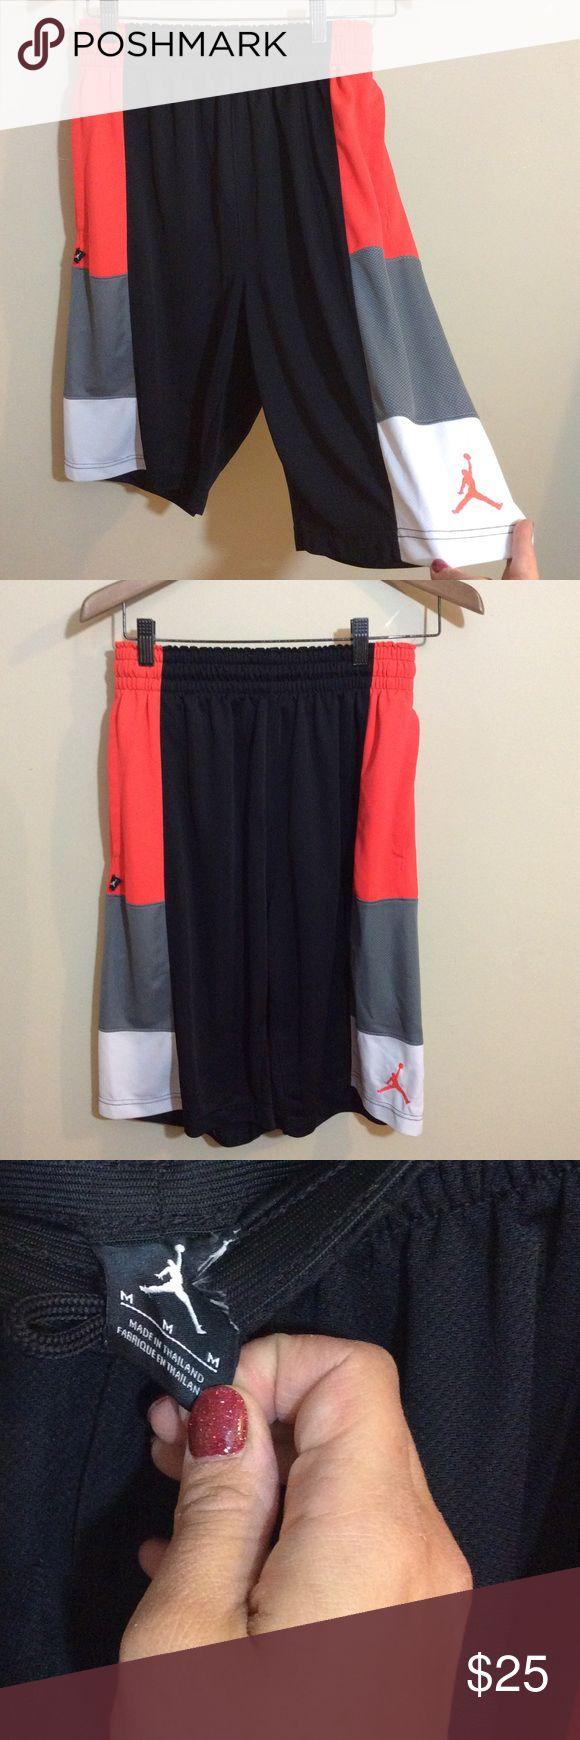 "Nike Air Jordan Trillionaire NBA Basketball Shorts Nike ""Air Jordan"" logo polyester basketball gym shorts. Size Medium. Nike Shorts Athletic"